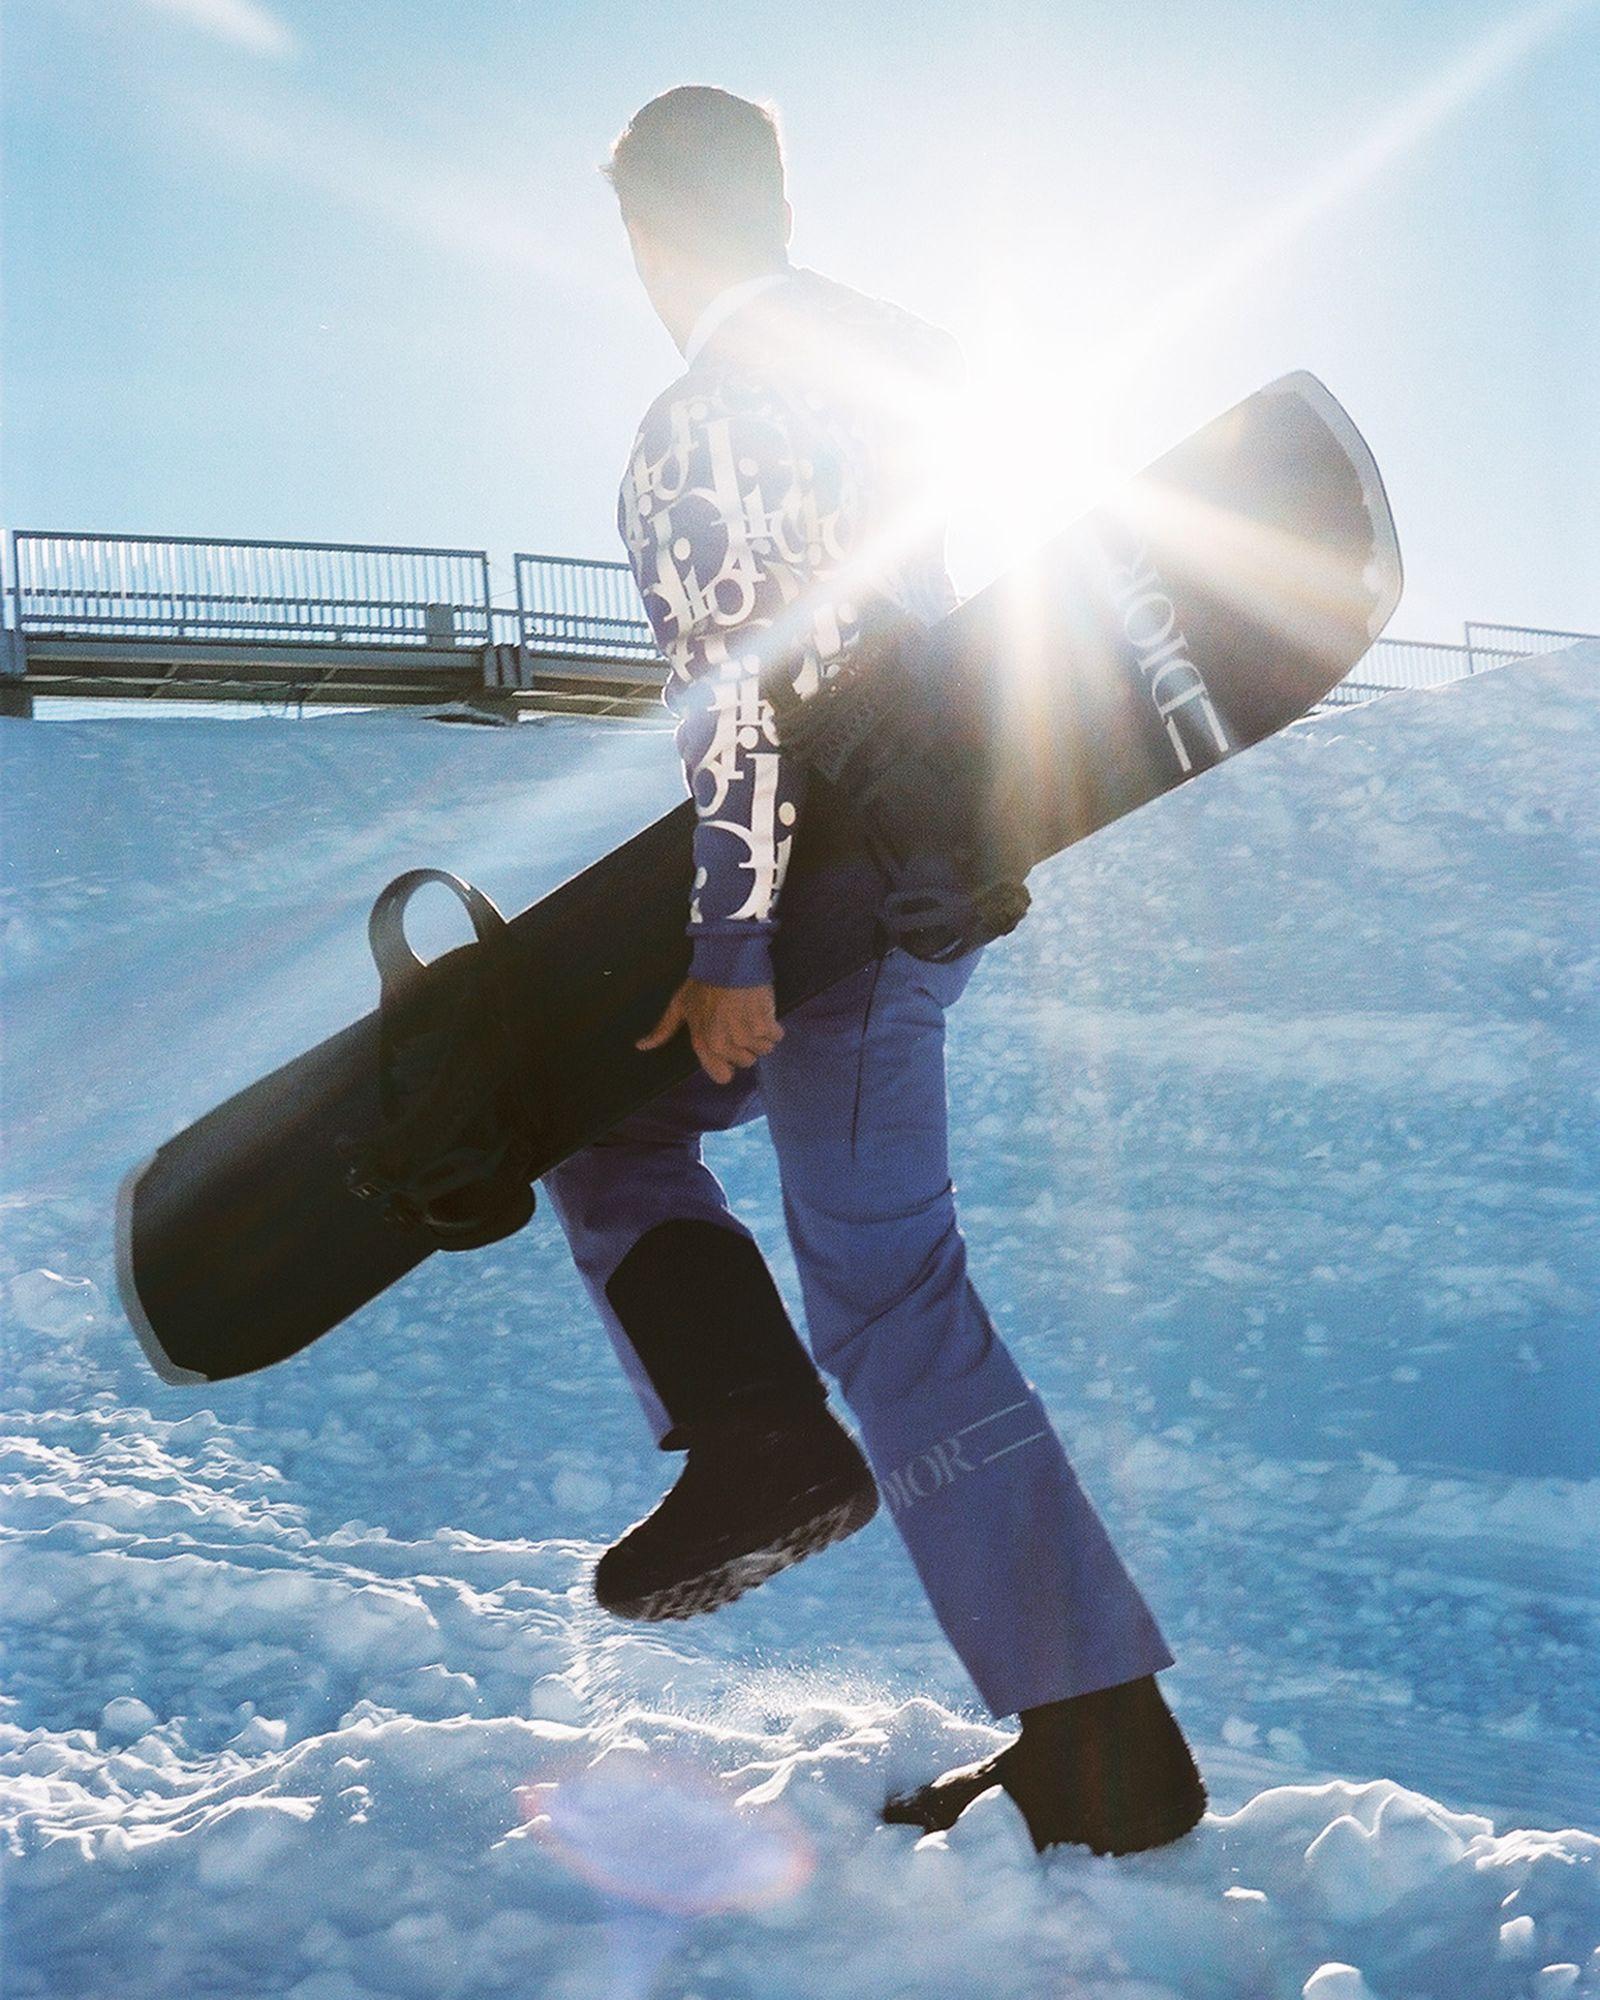 dior-ski-capsule-09